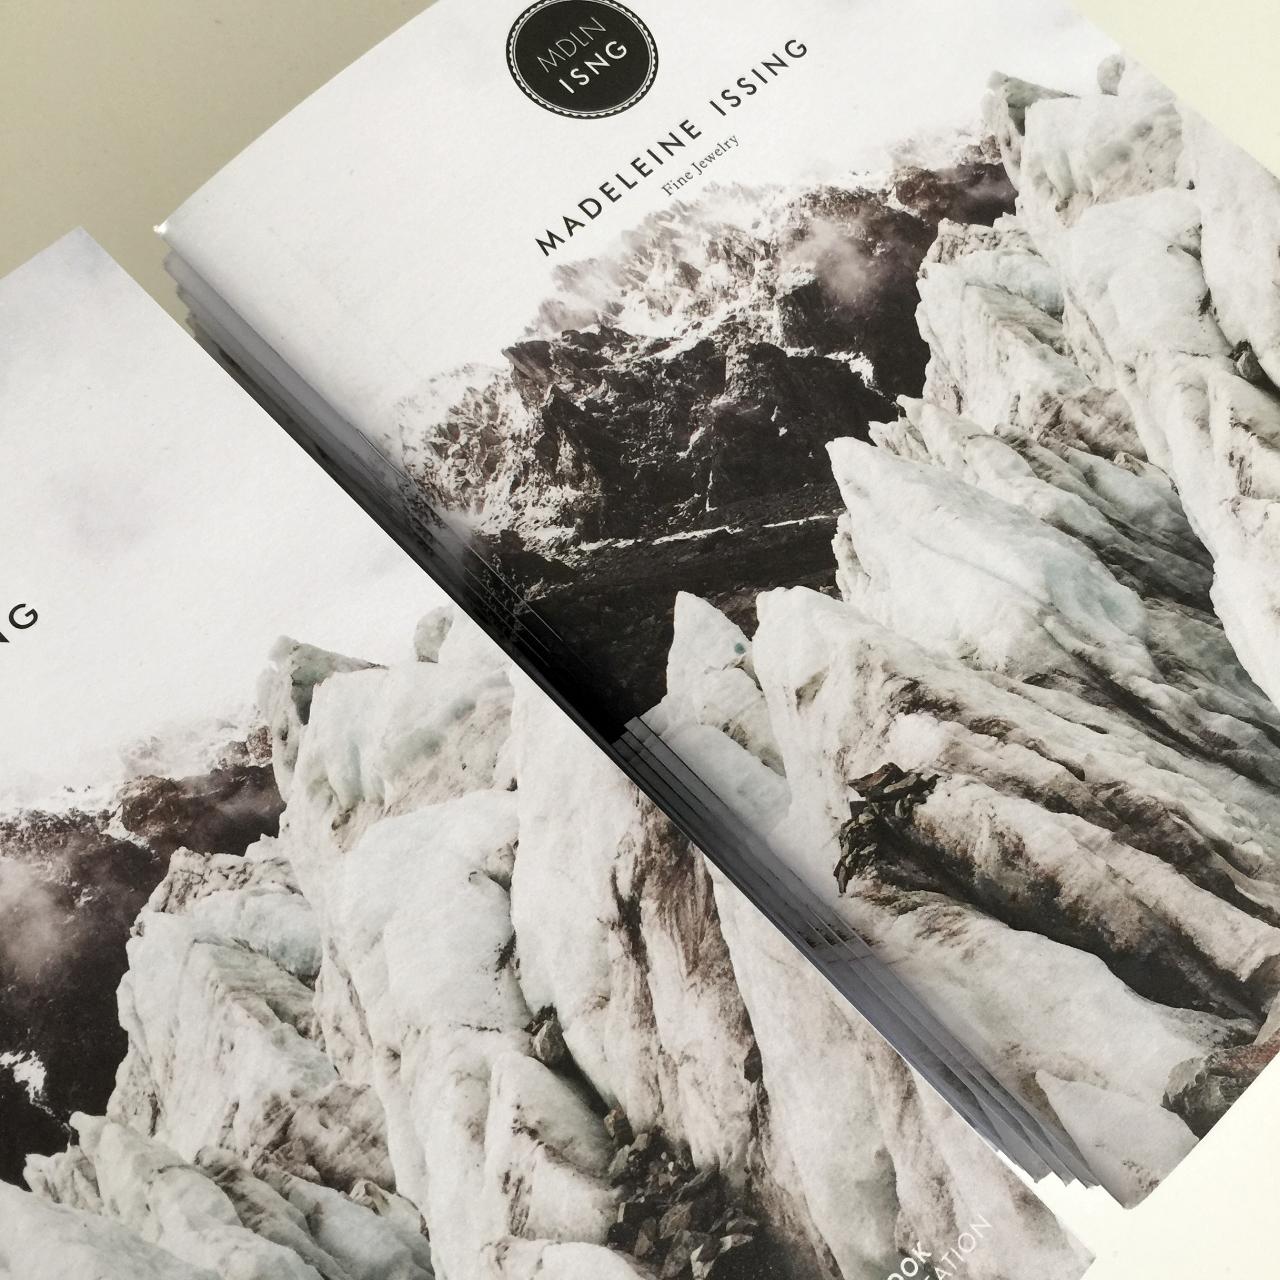 Kalkspat Calcite Lookbook Cover Madeleine Issing